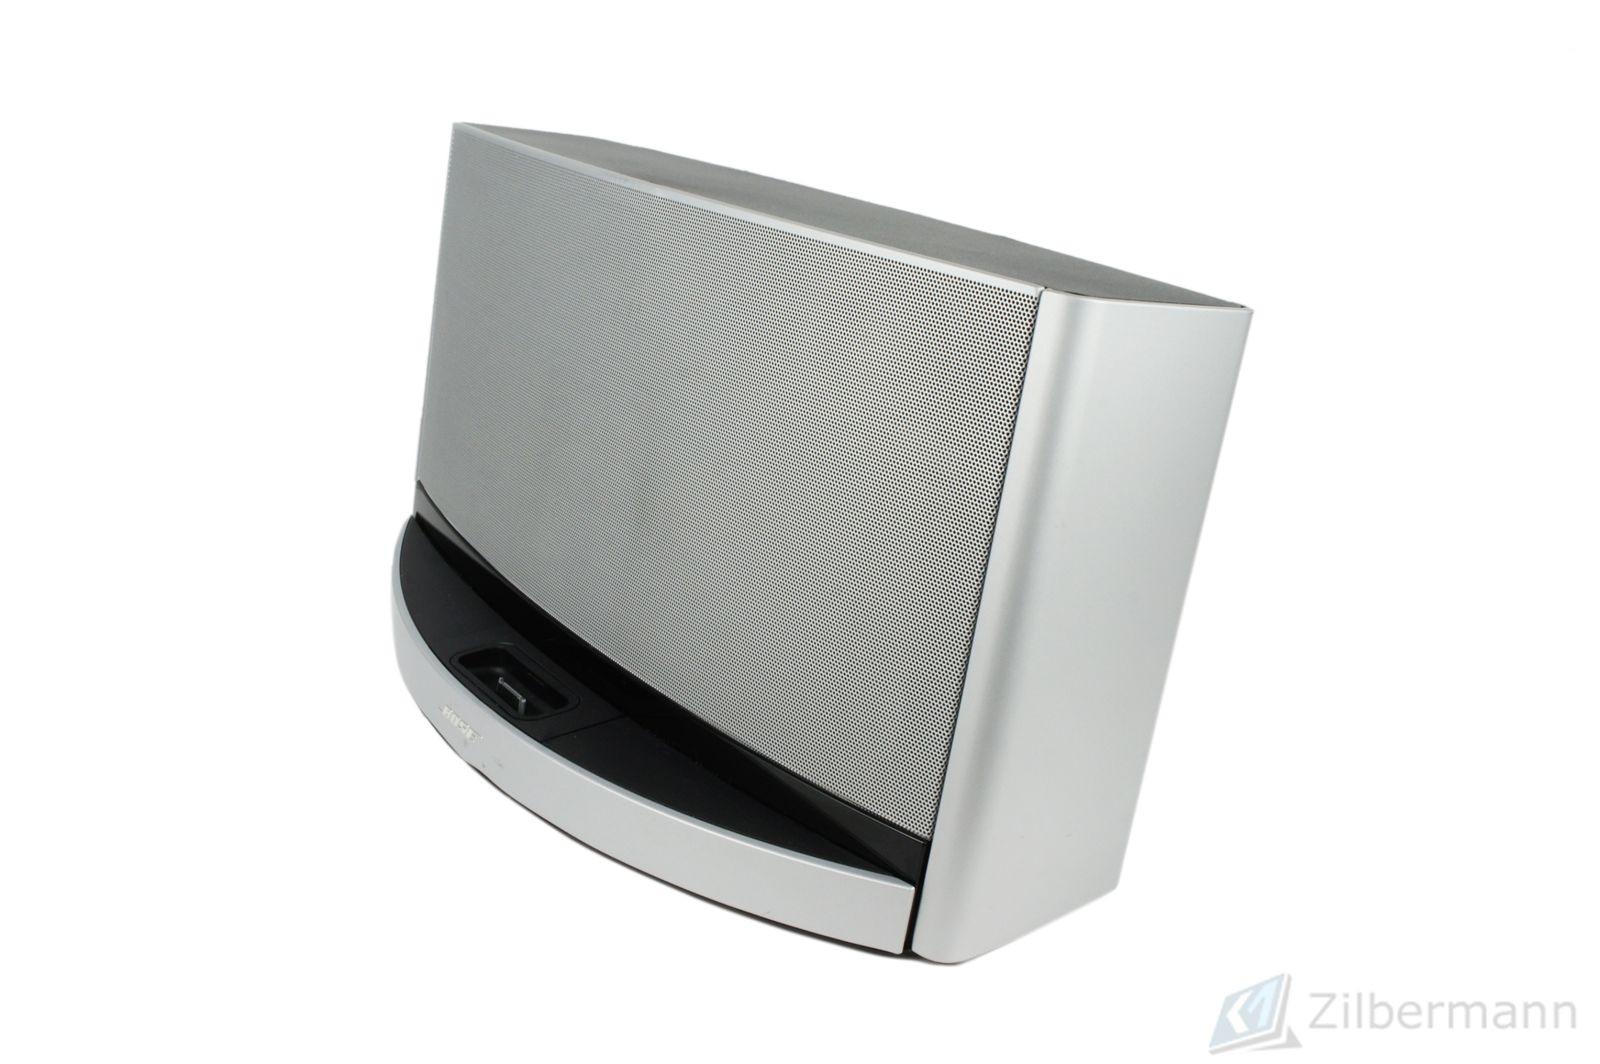 Bose SoundDock 10 Digital Music System 07 - Ebay Shop